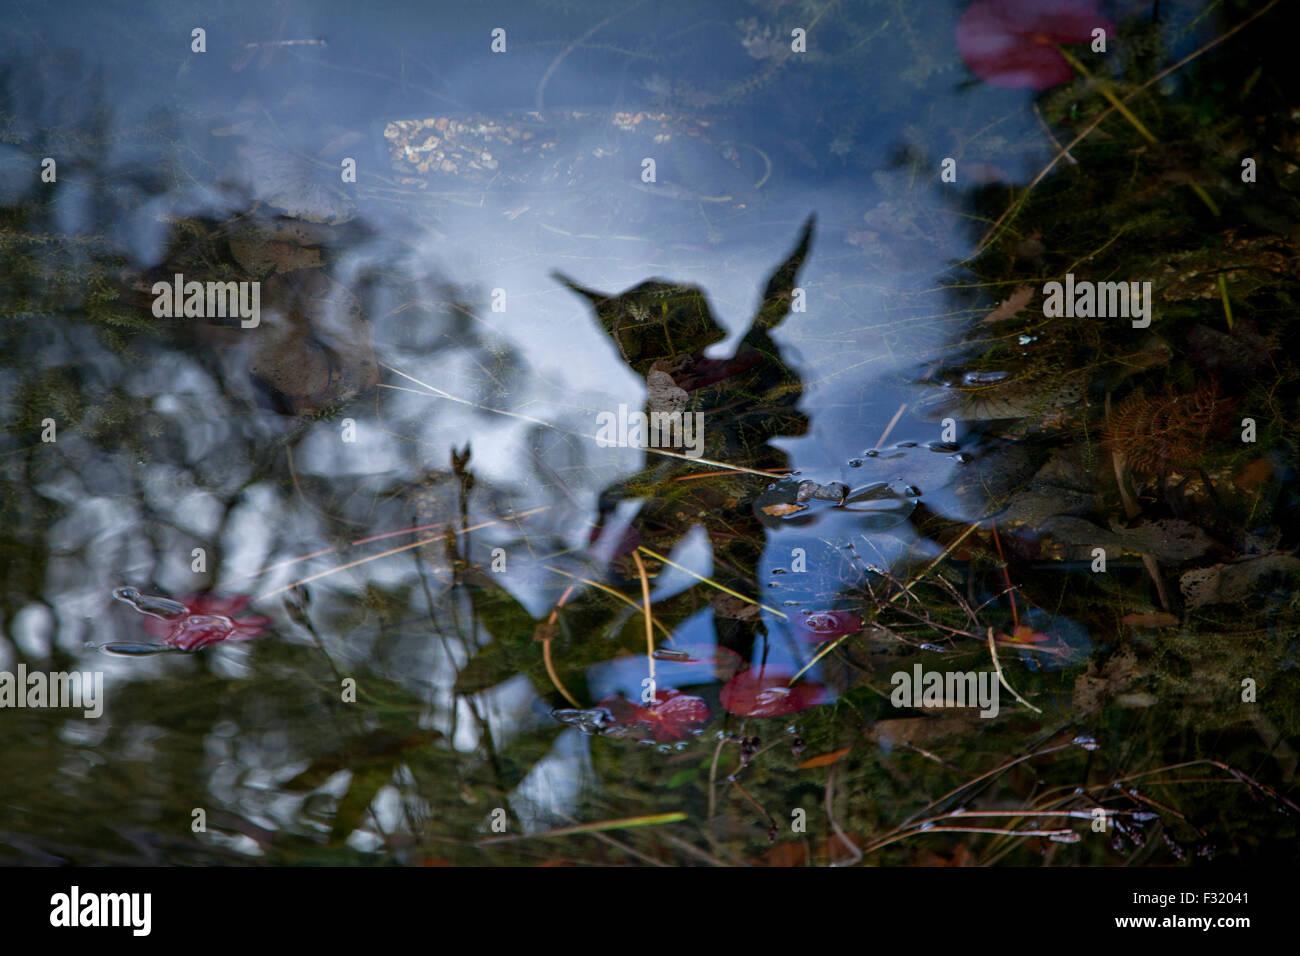 Fairy reflection - Stock Image